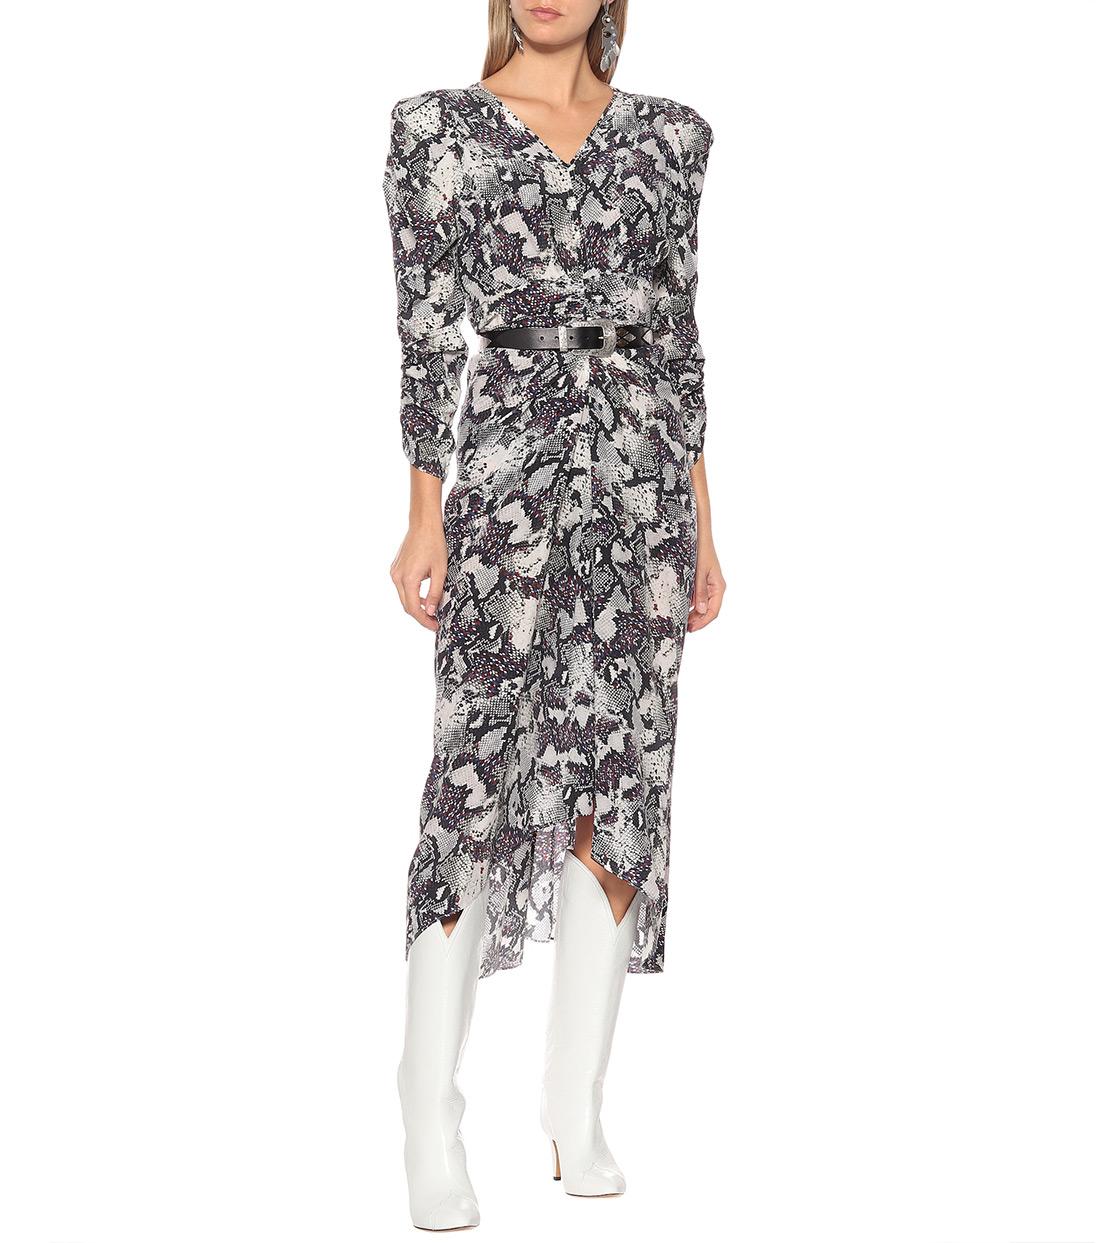 street style zagreb ženska moda jesen zima 2019/2020 kako kombinirati zmijski uzorka špica zagreb zagrebačka špica asos topshop h&m mytheresa designers look Isabel Marant snake dress white boots